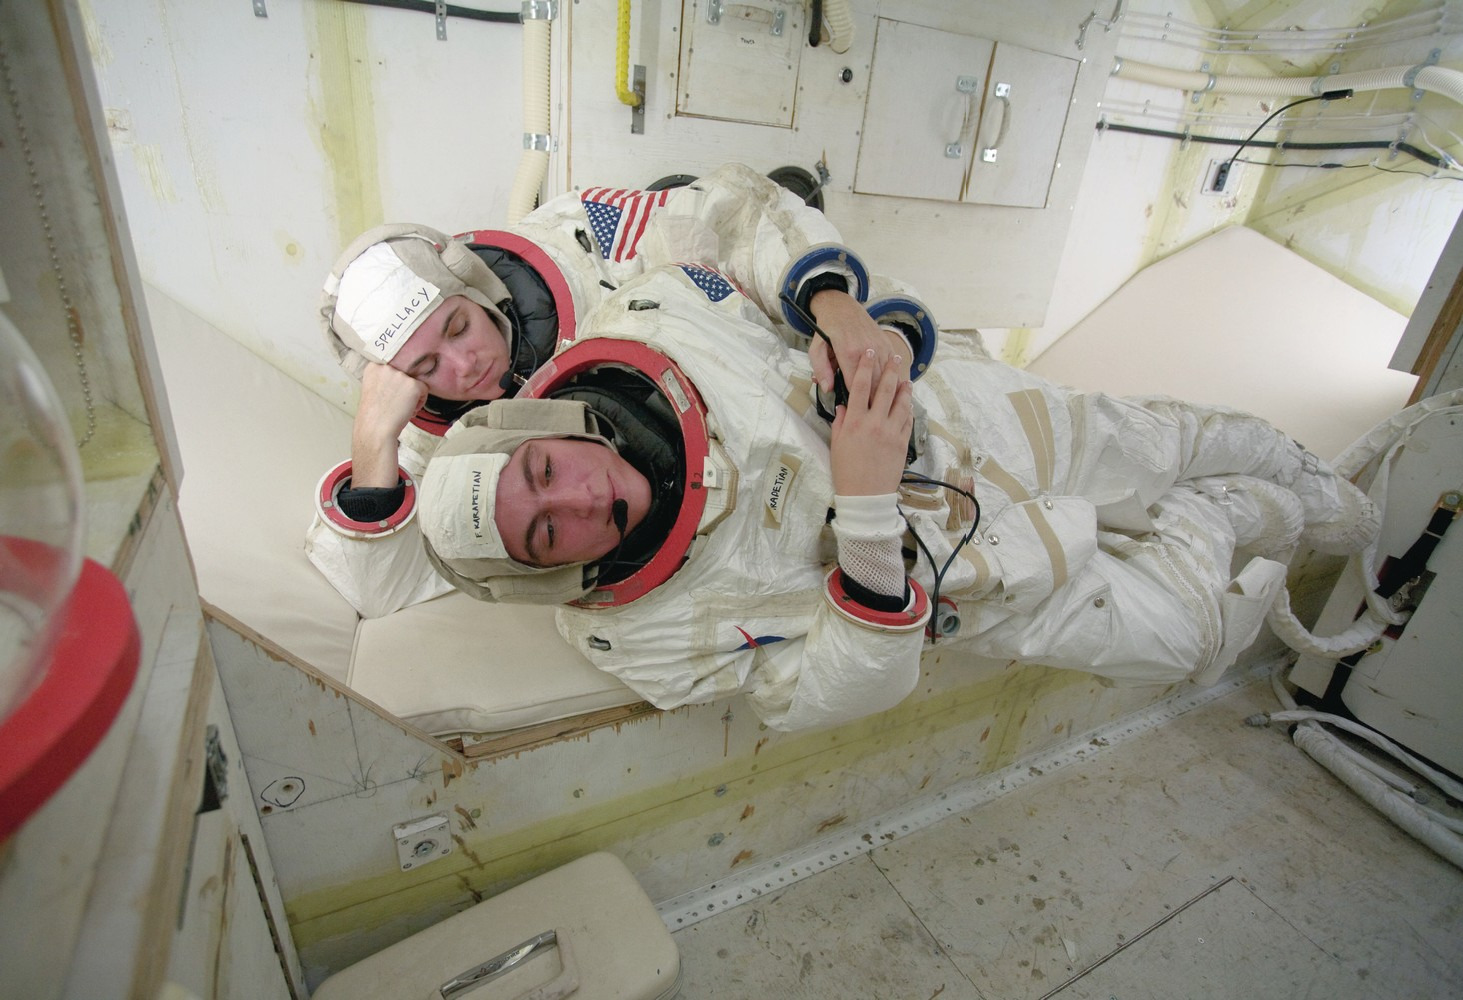 Astronauts Allyson Spellacy and Farrah Karapetian, Space Program, 2007 Courtesy Gagosian Gallery